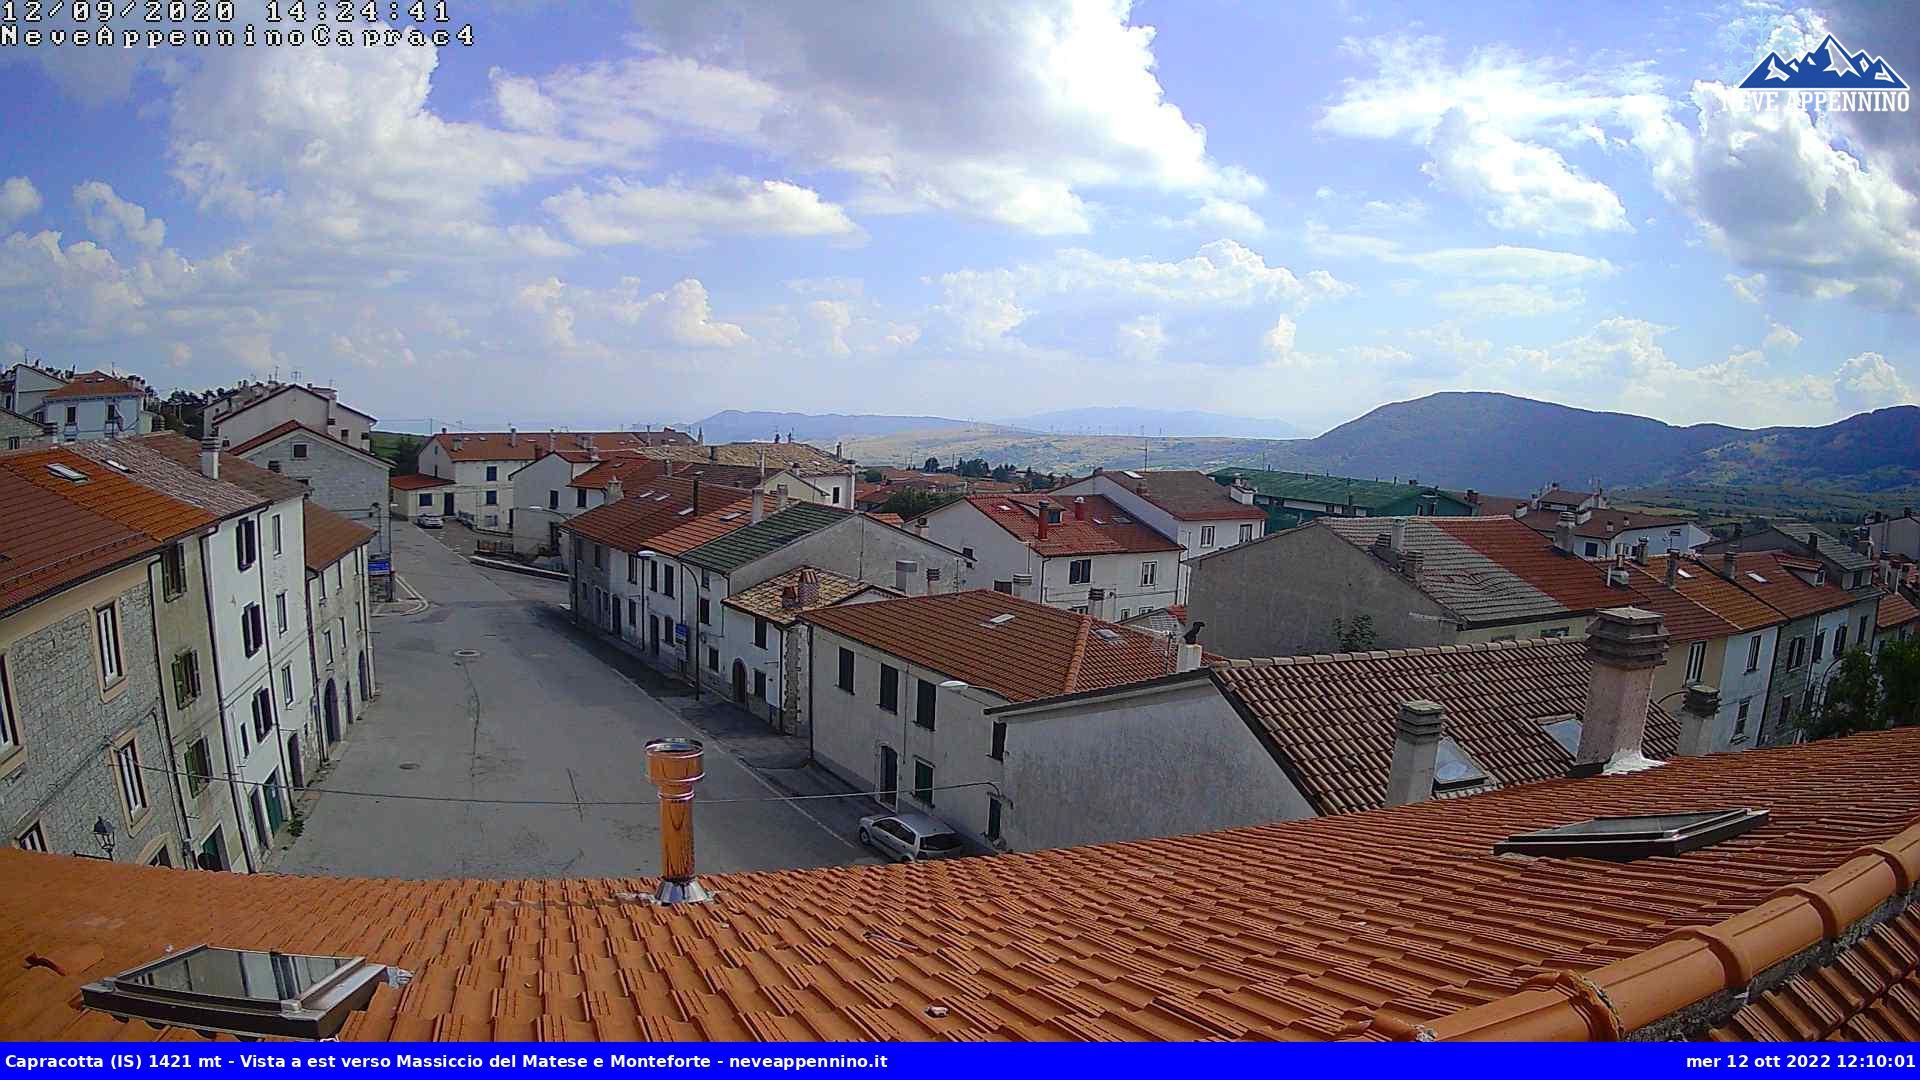 webcam comune di Capracotta, Molise Italy